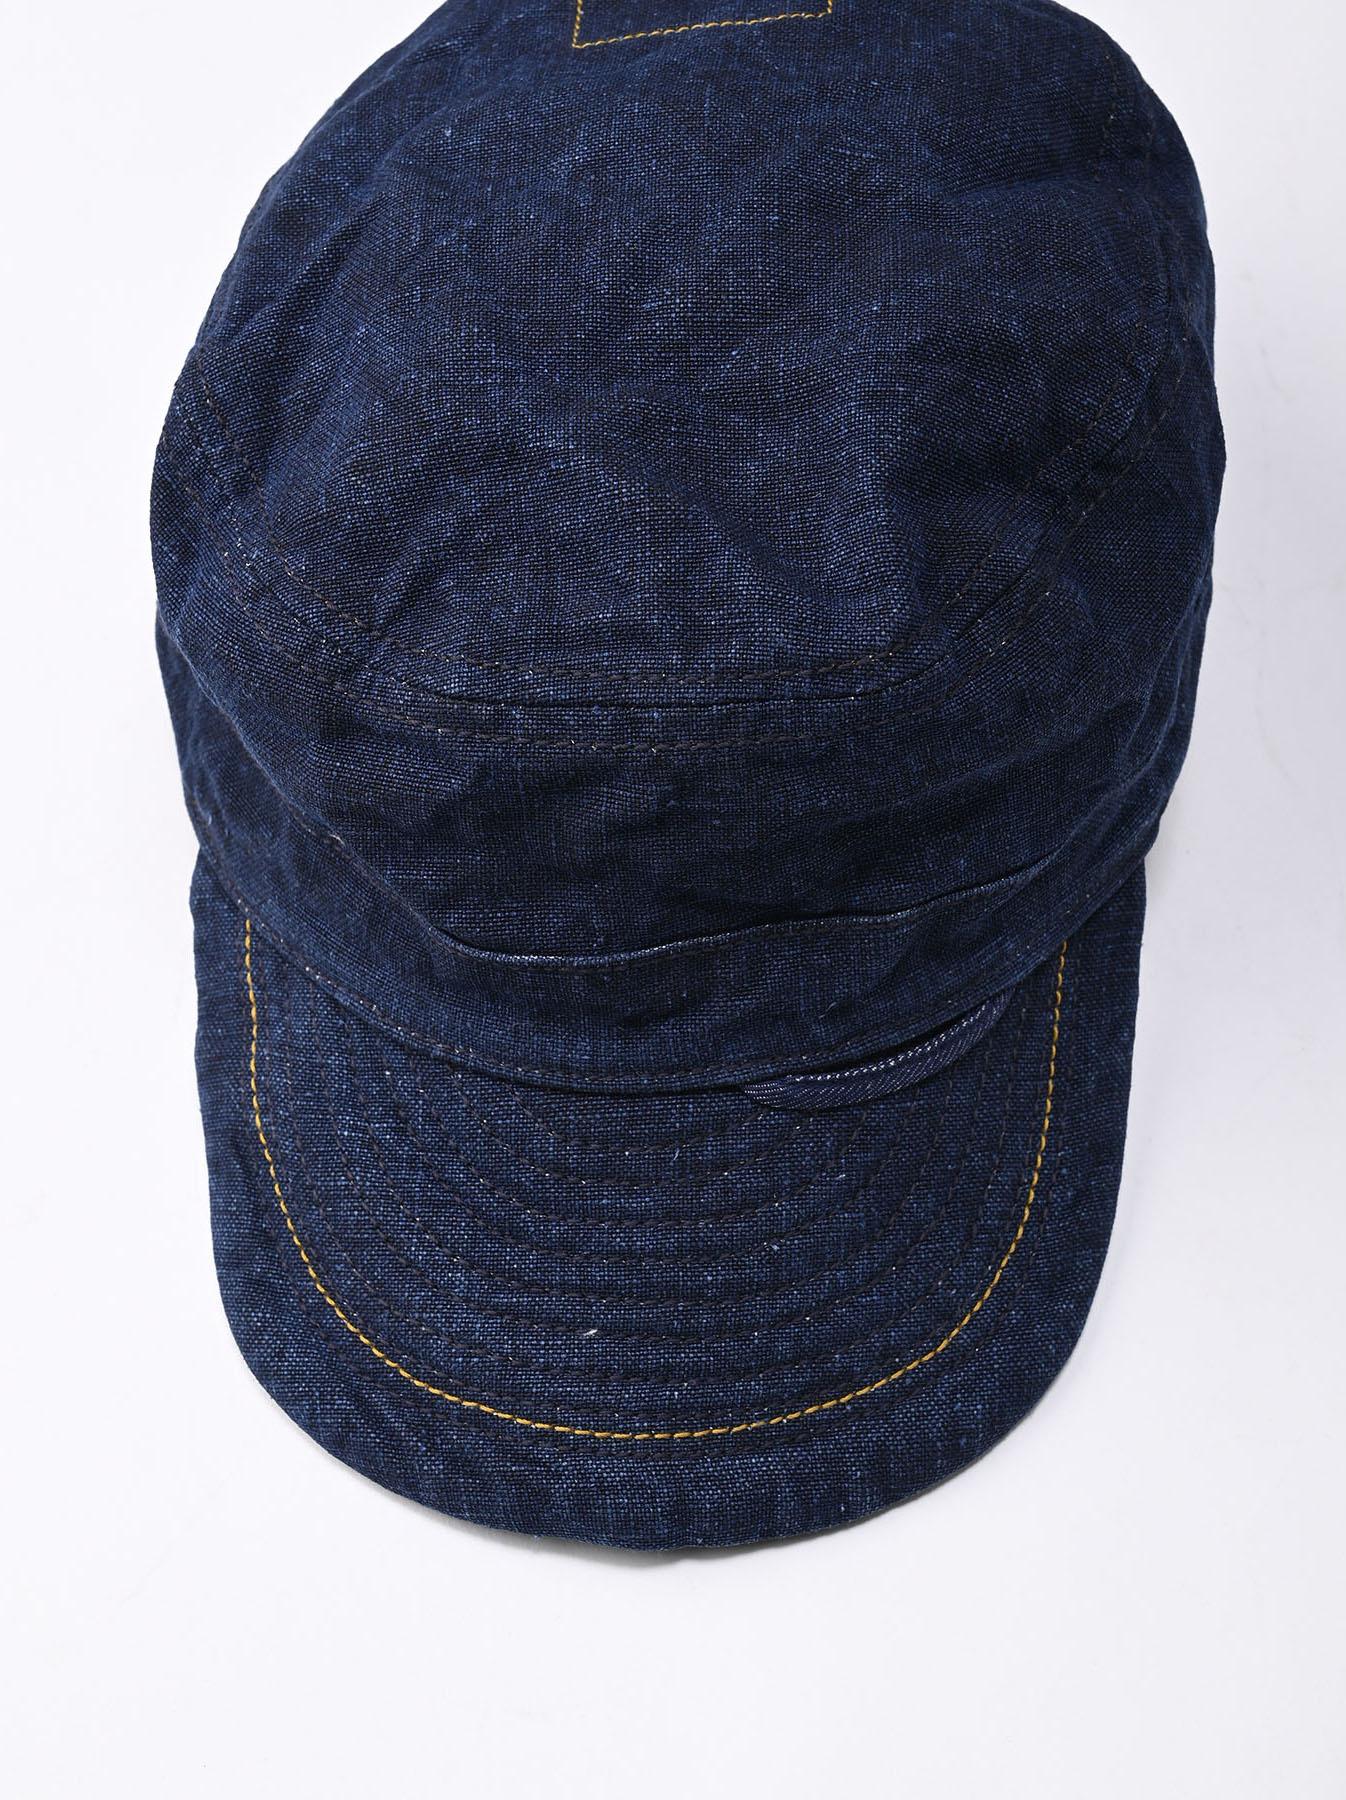 Indigo Linen Duck Work Cap (0421)-5